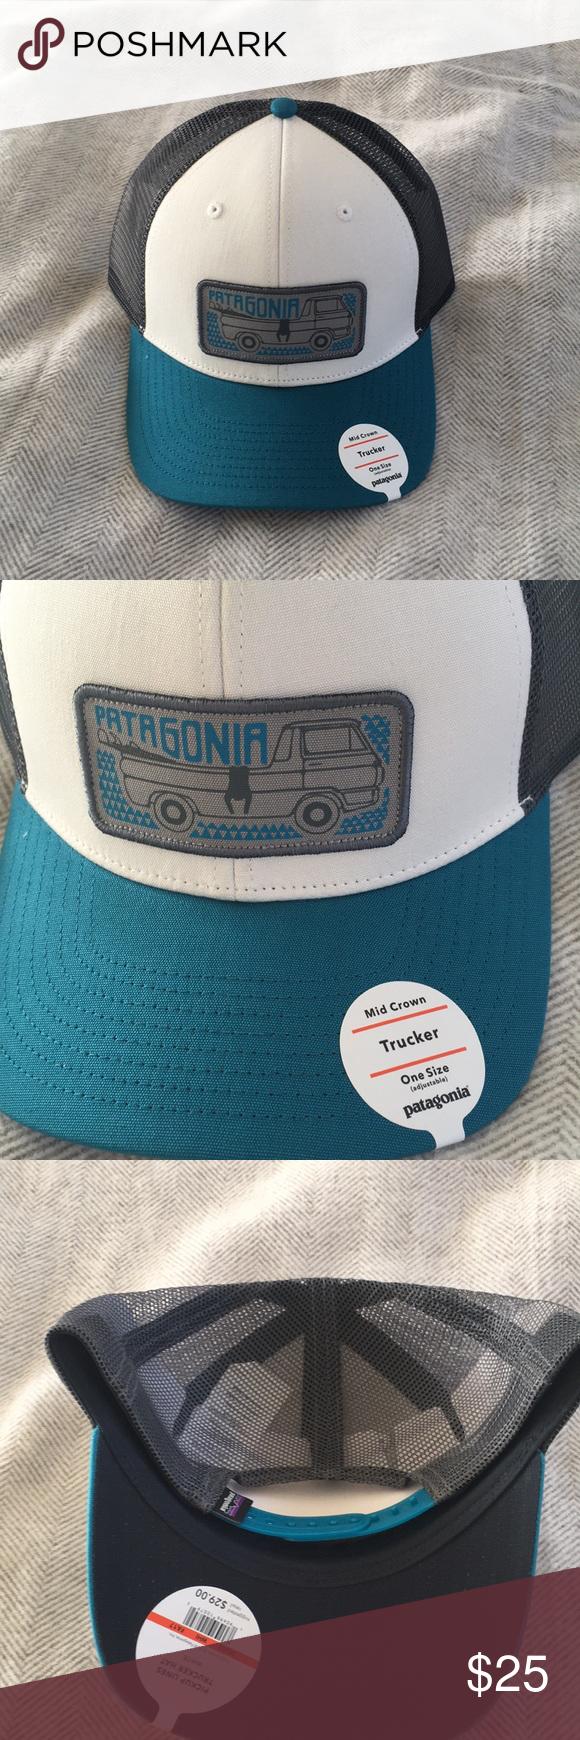 Patagonia Hat Brand new mid crown trucker hat so cute! Patagonia